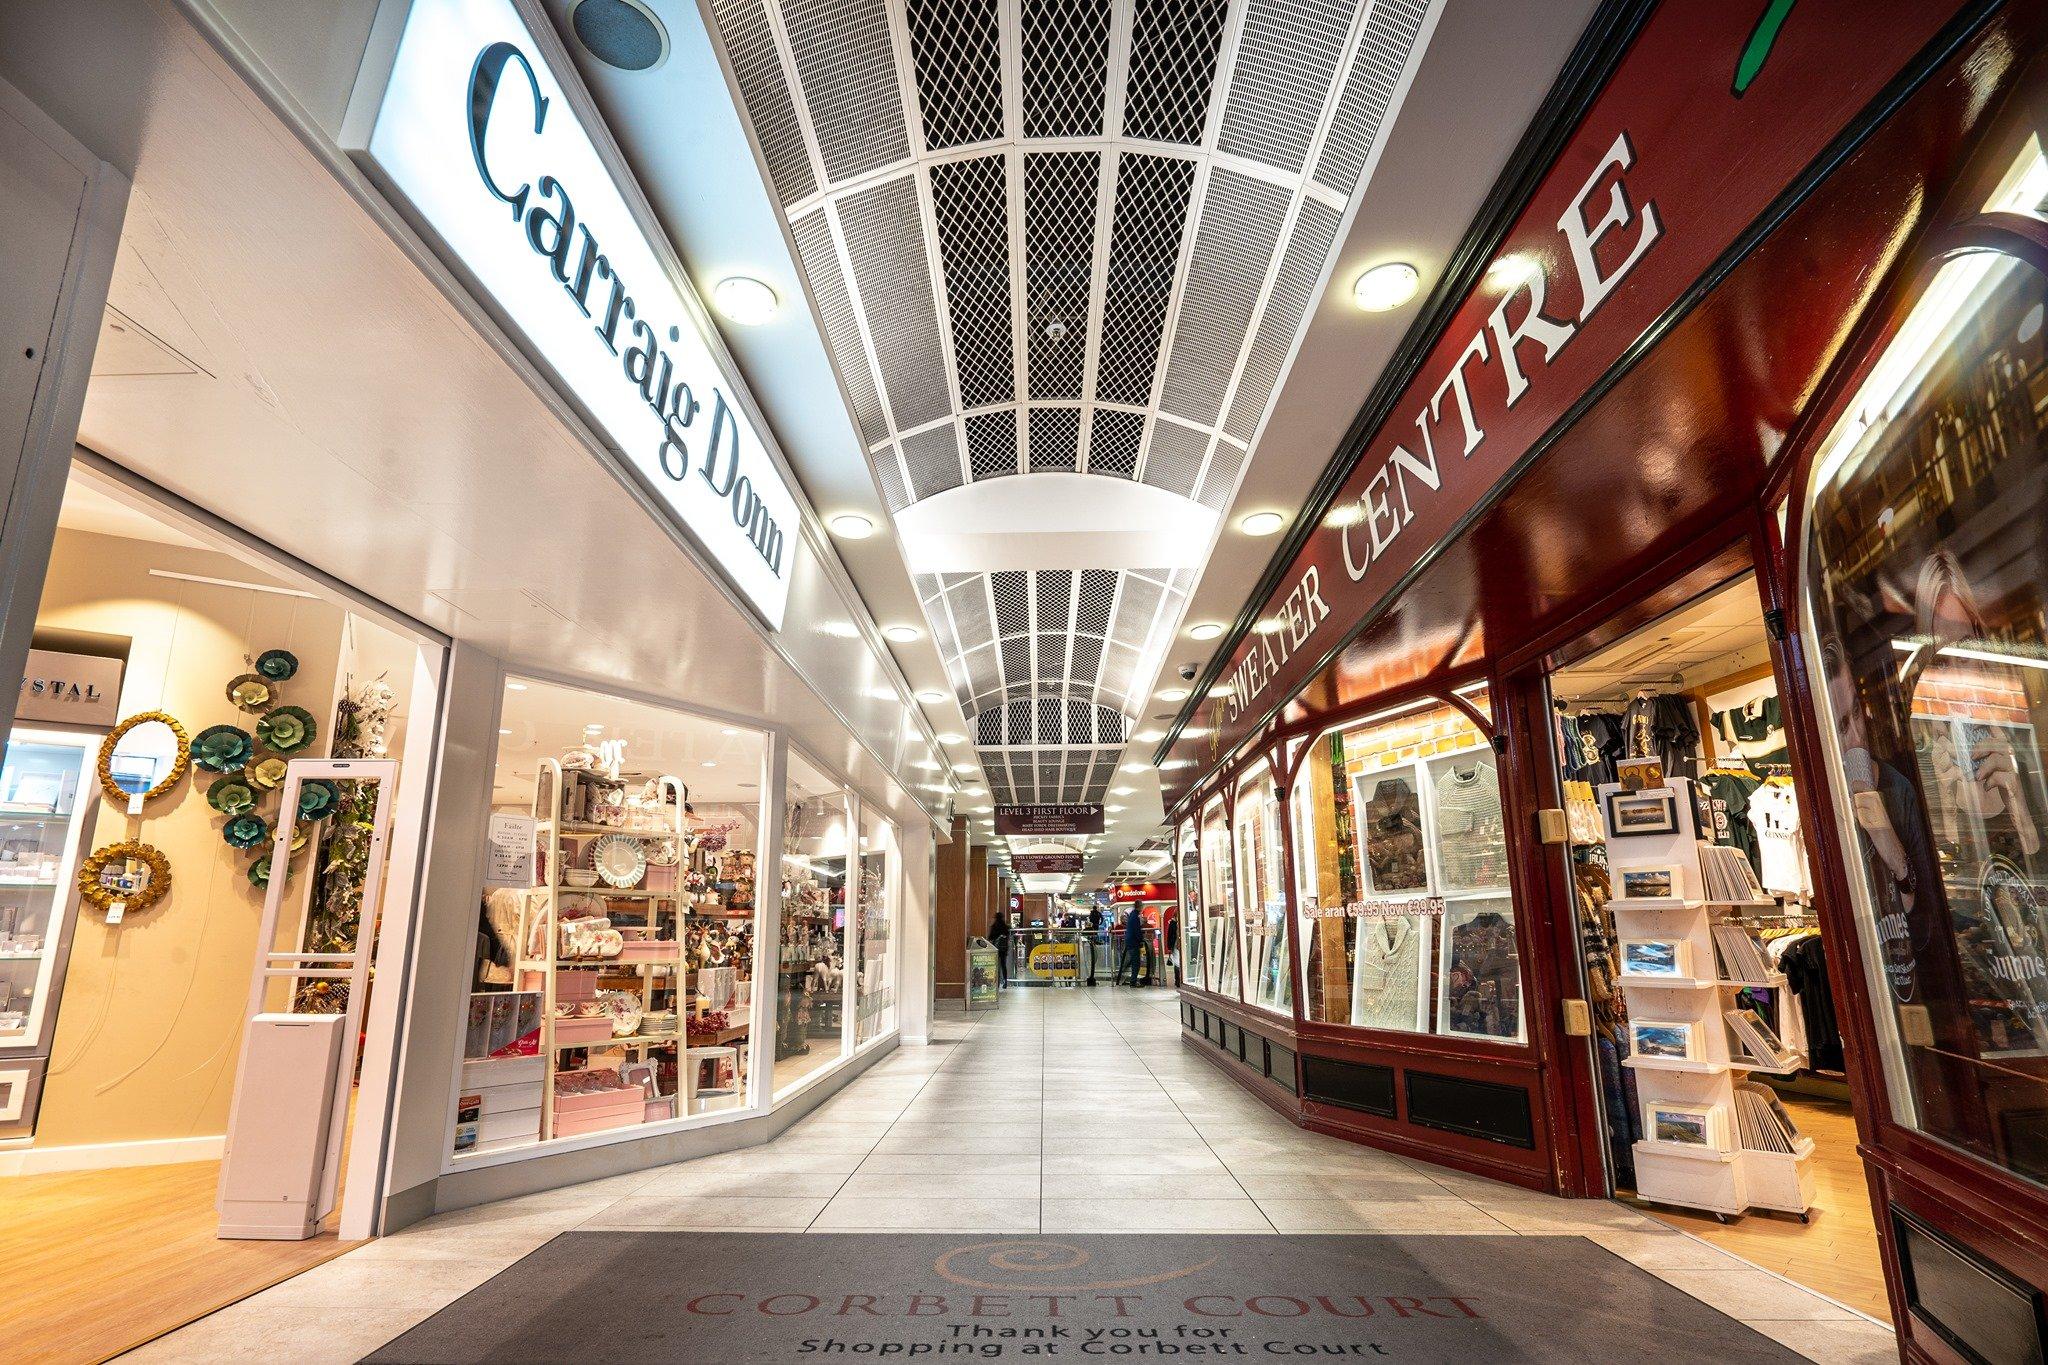 Corbett Court Shopping Centre in Galway - Visit Galway